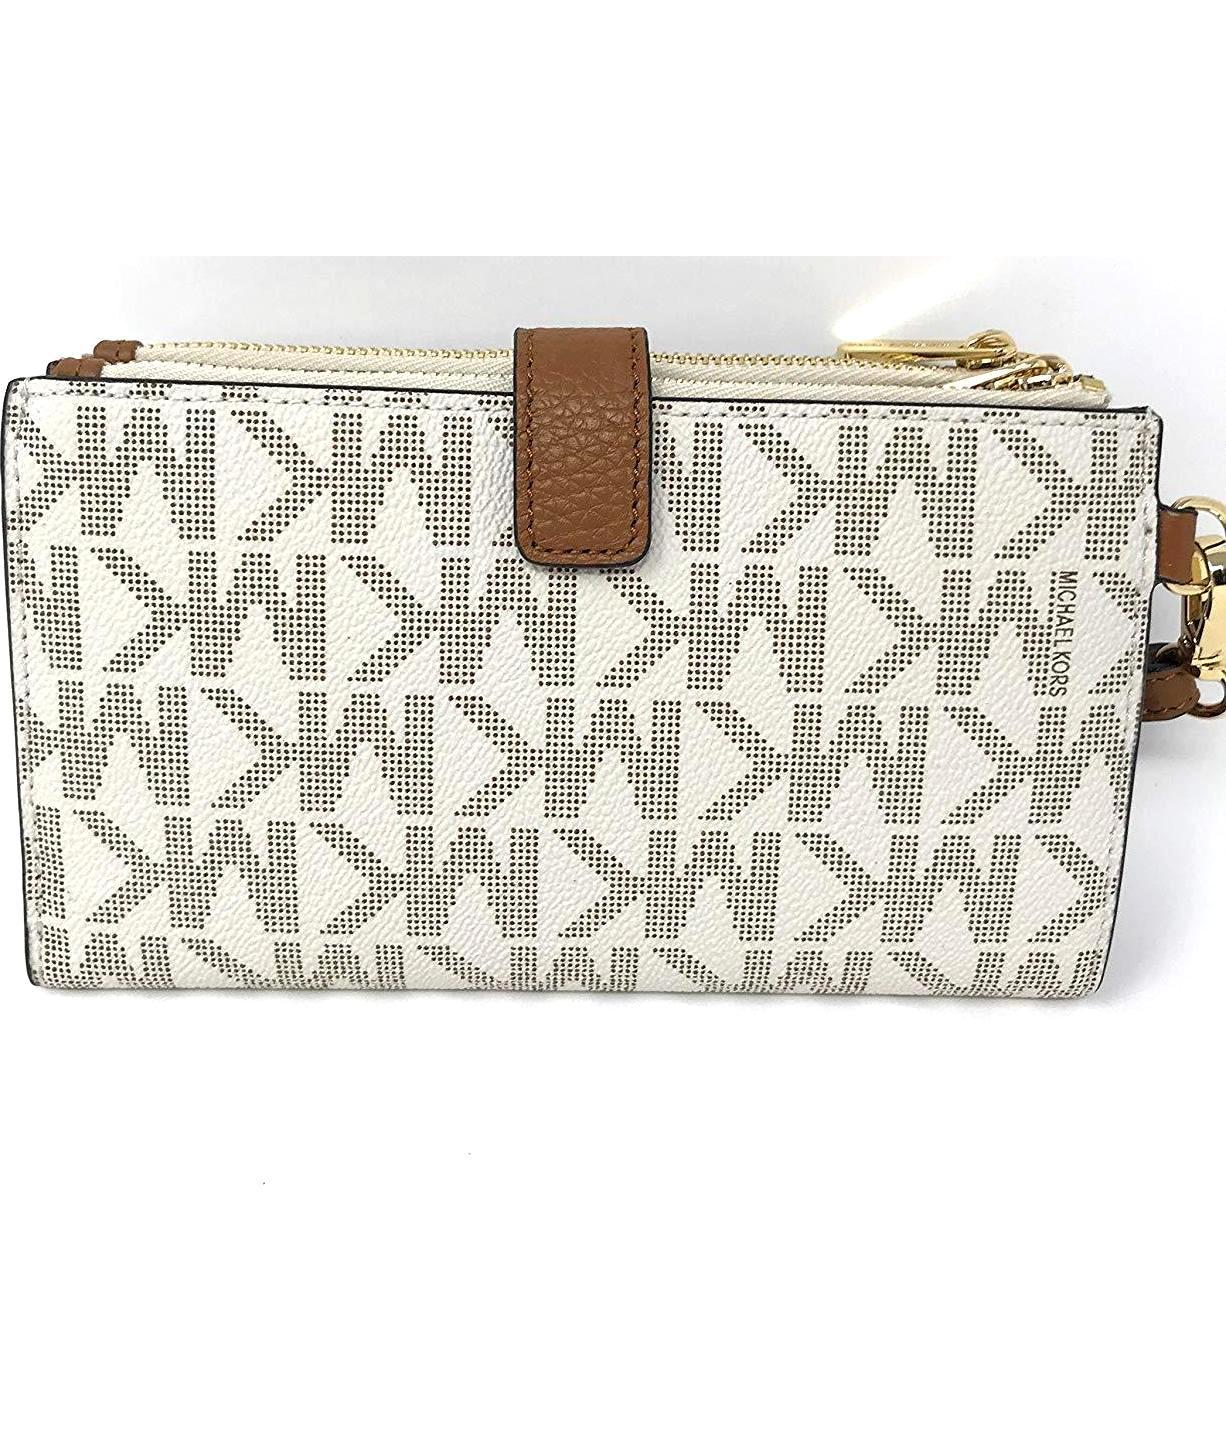 9f6eaa1216536 Jet Set Travel double Zip Wristlet in Vanilla Acorn - Authentic Designer  Clothes